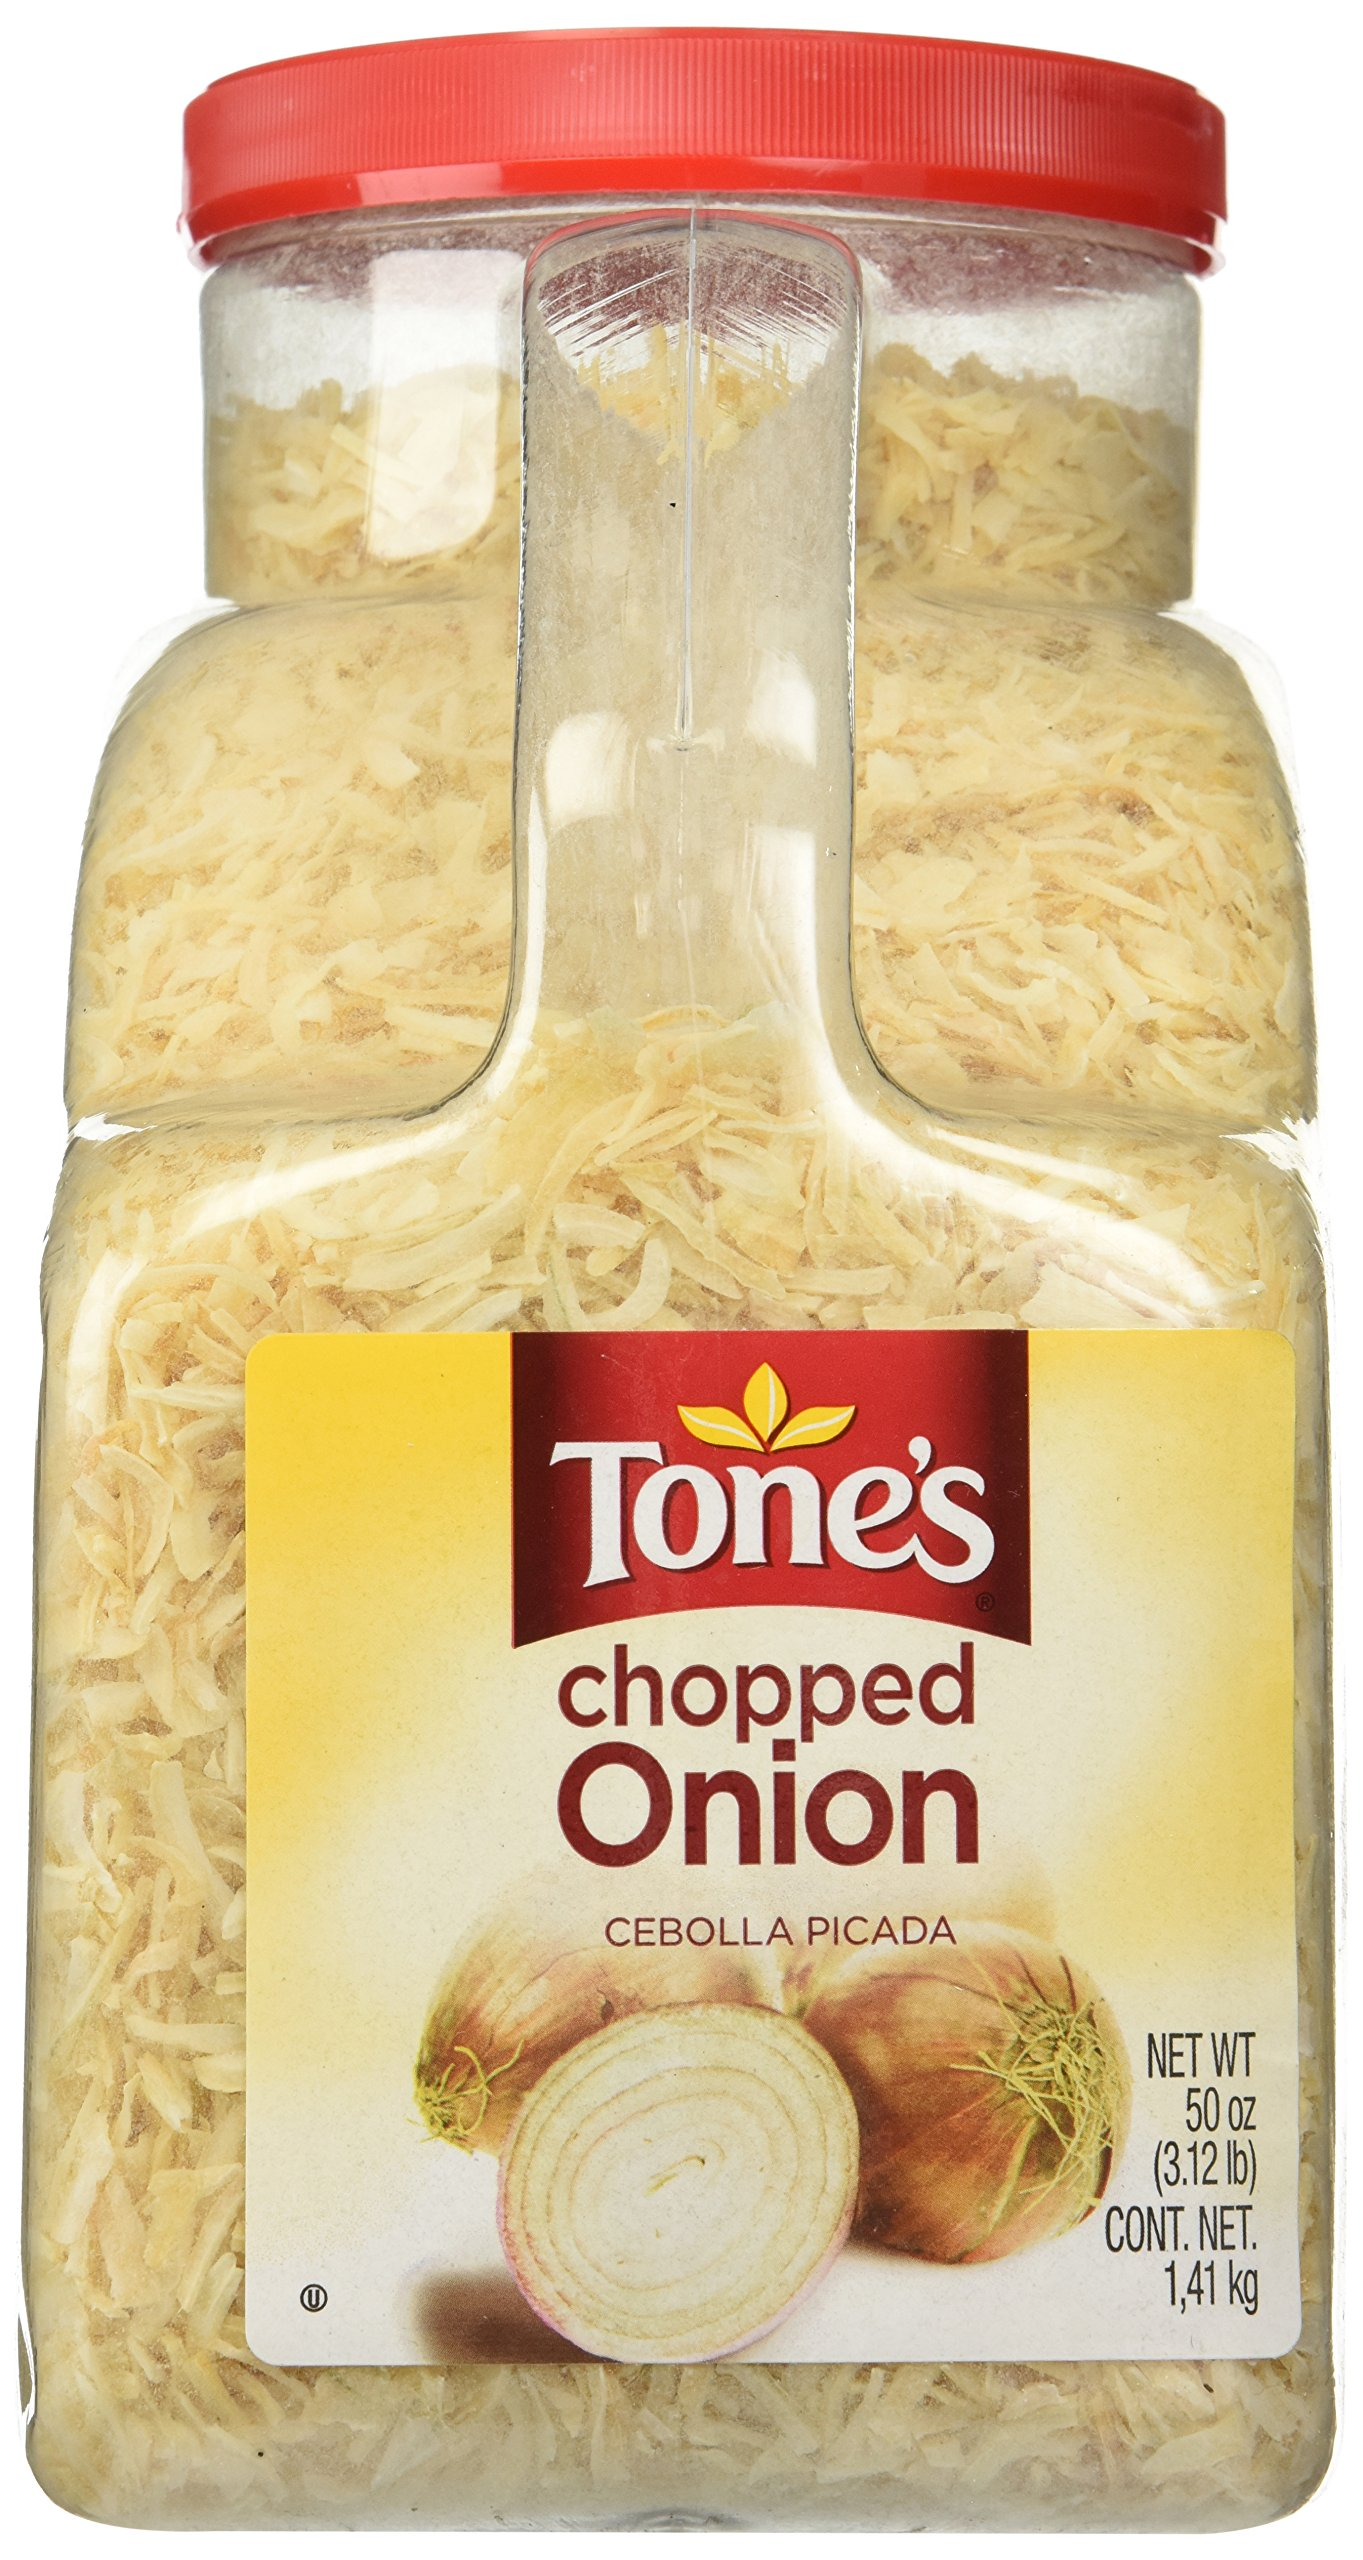 Tone's Chopped Onion - 50 oz.